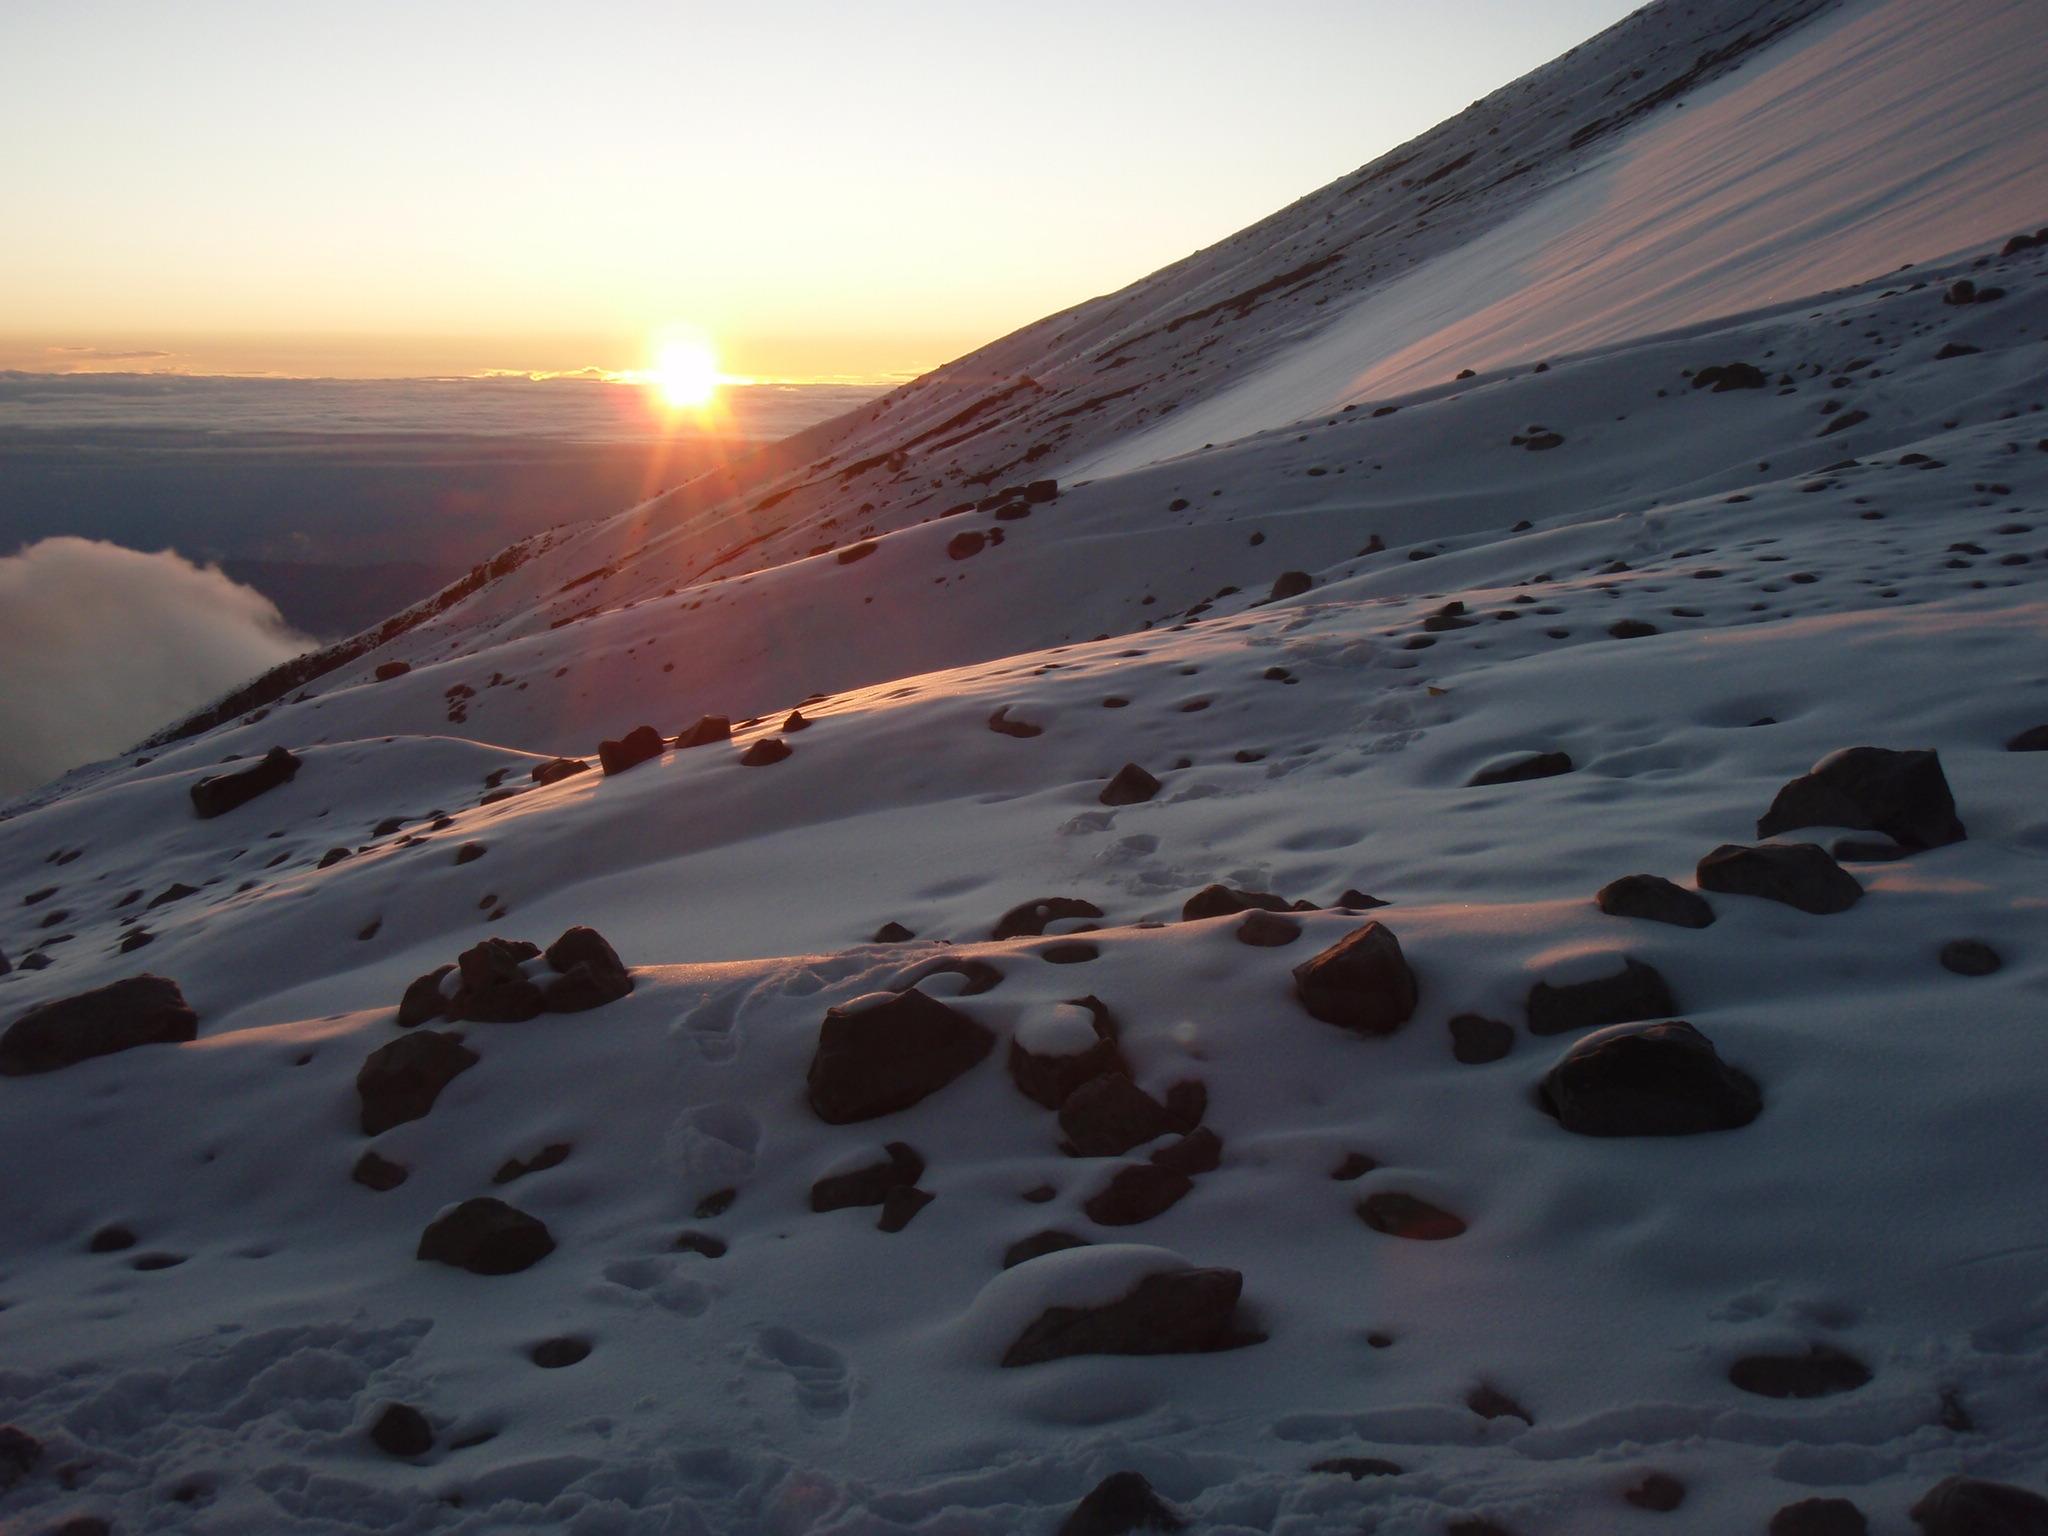 Sunrise around 6:30am from beginning of Jamapa glacier